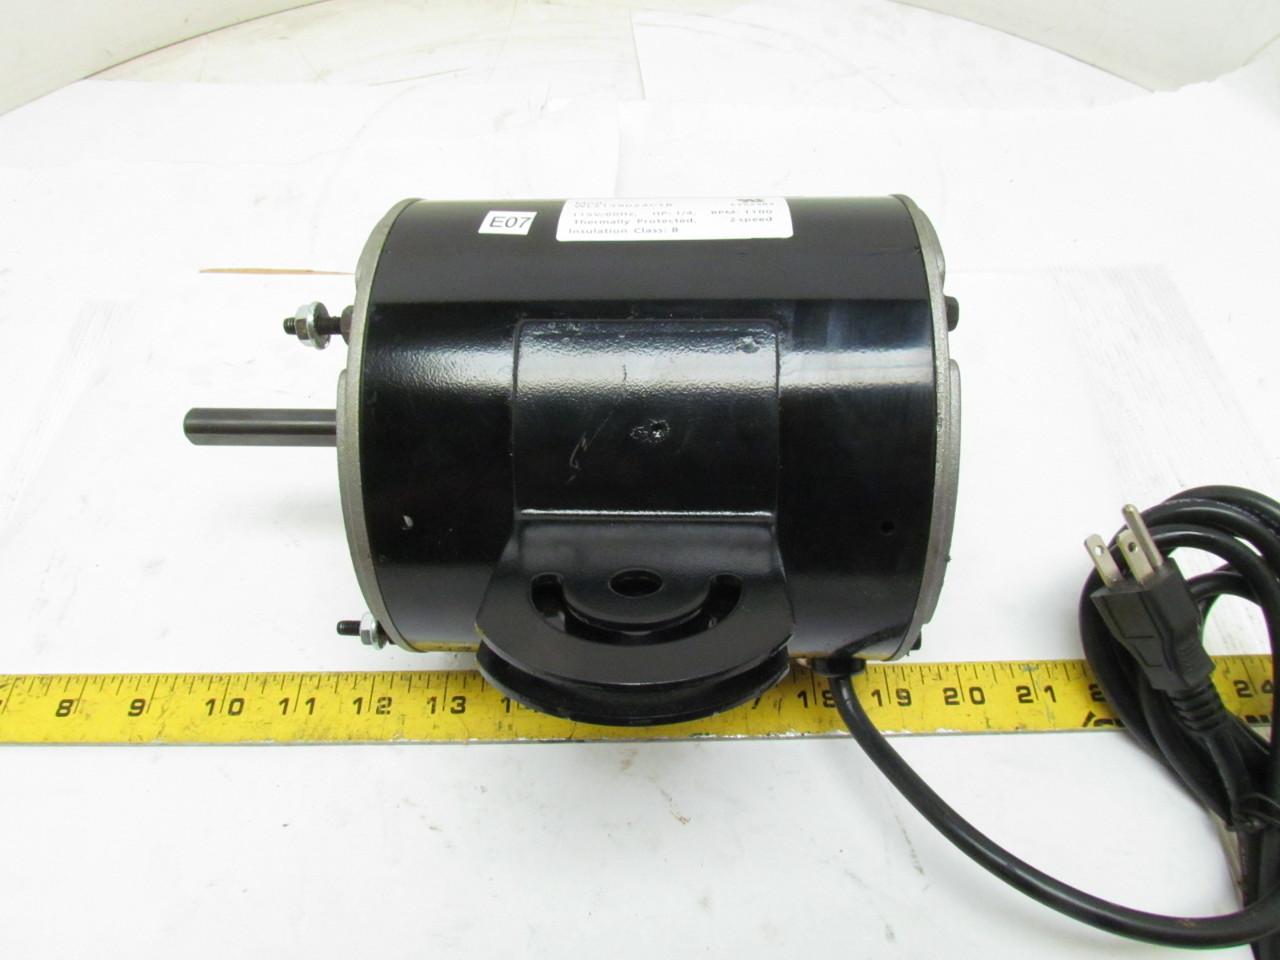 Dayton 1rwb4 1ph single phase electric fan motor 1 4hp for Dayton electric fan motors